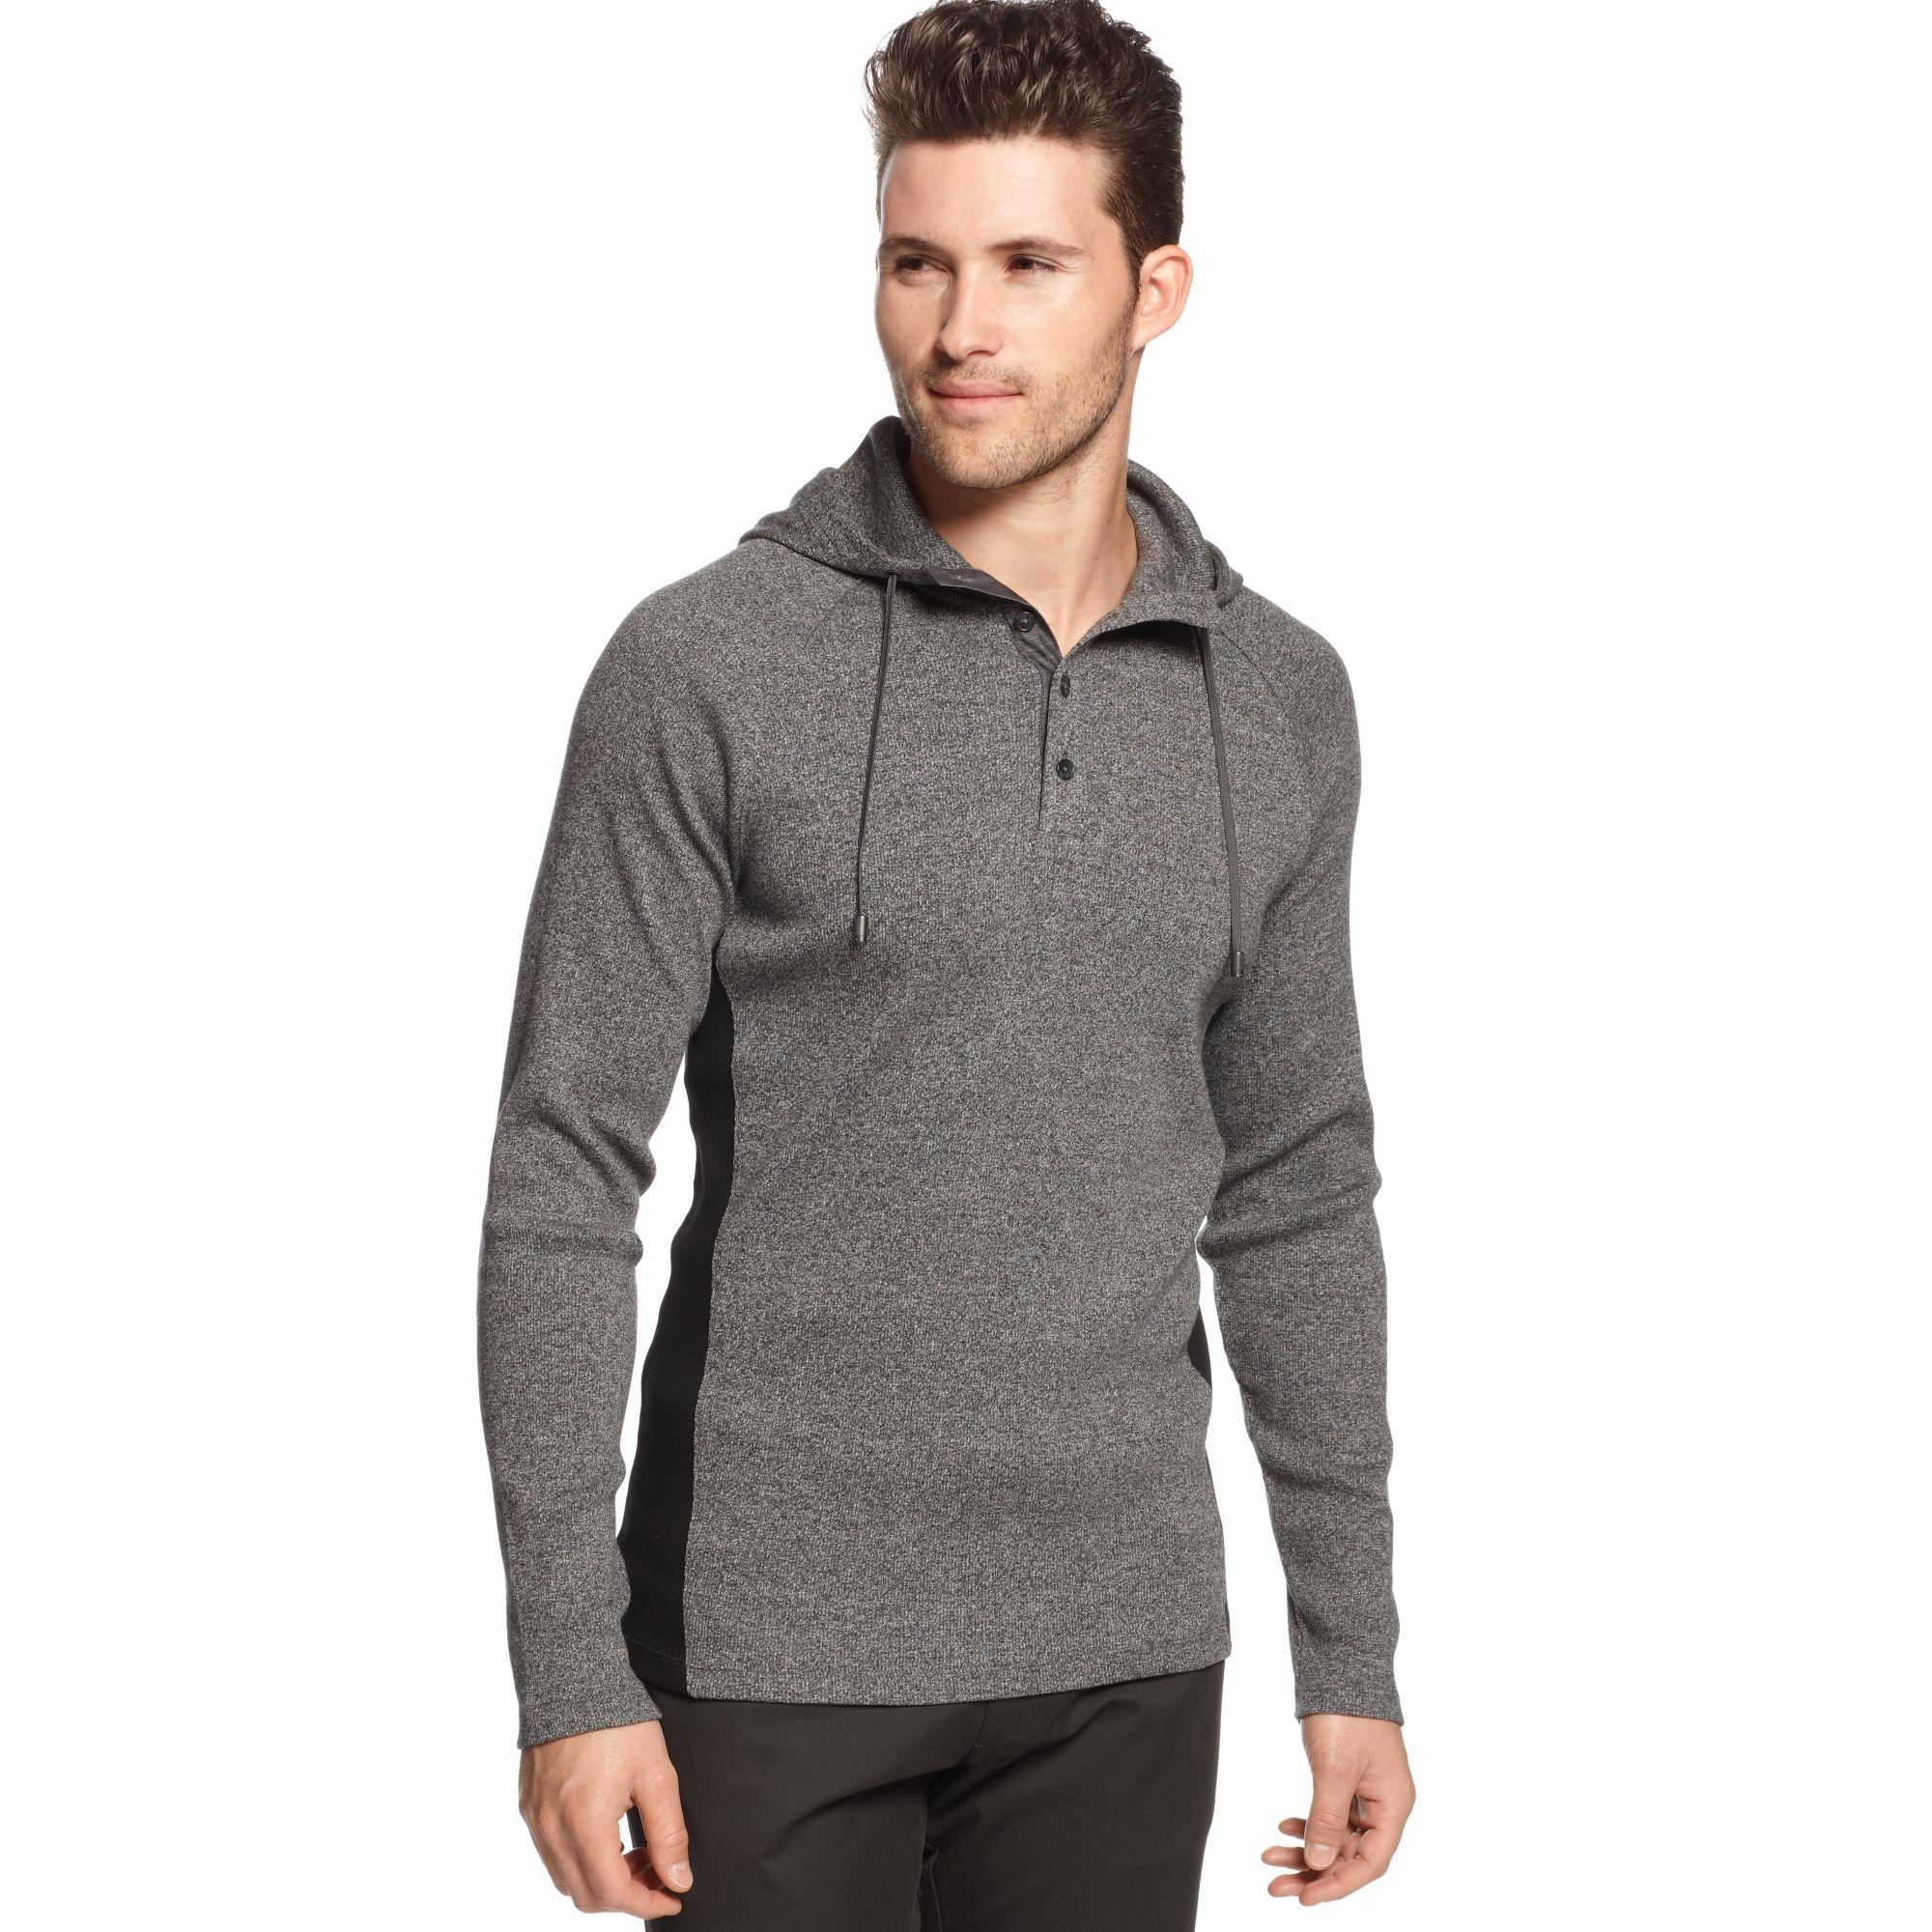 calvin klein jeans henley hoodie in gray for men black marled lyst. Black Bedroom Furniture Sets. Home Design Ideas